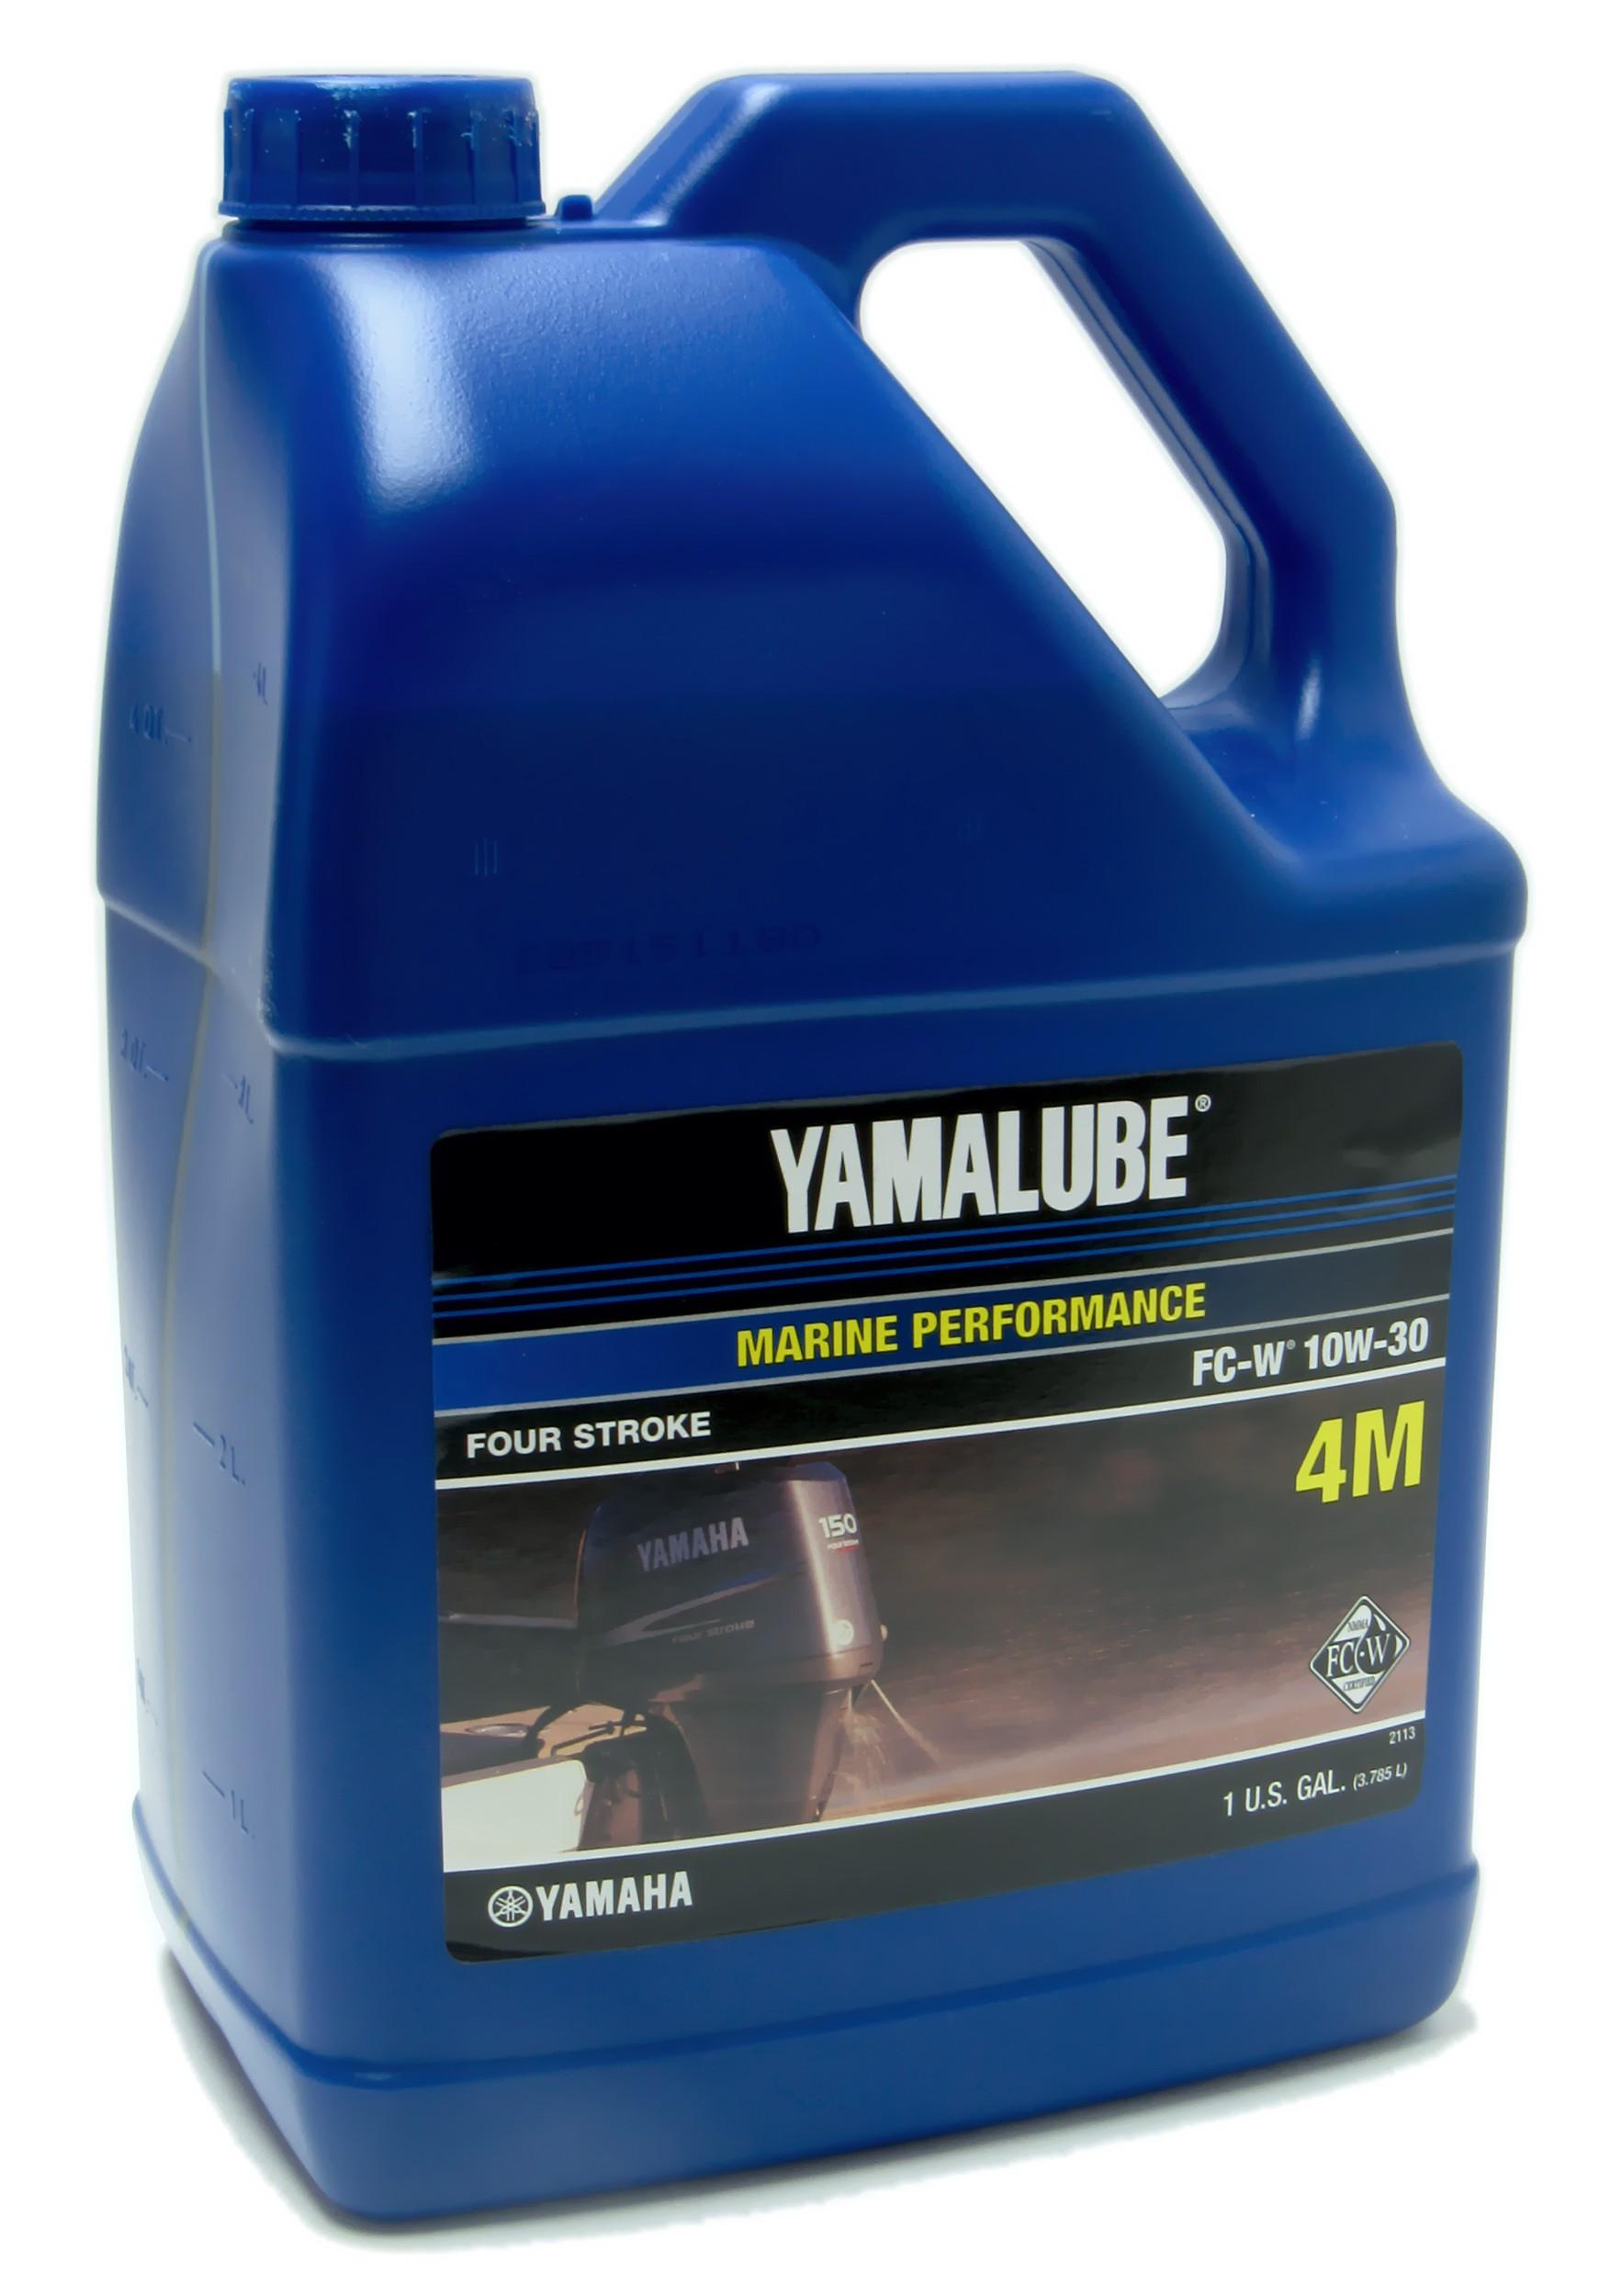 Yamaha Yamalube 4m Outboard Fc W 10w 30 Four Stroke Engine